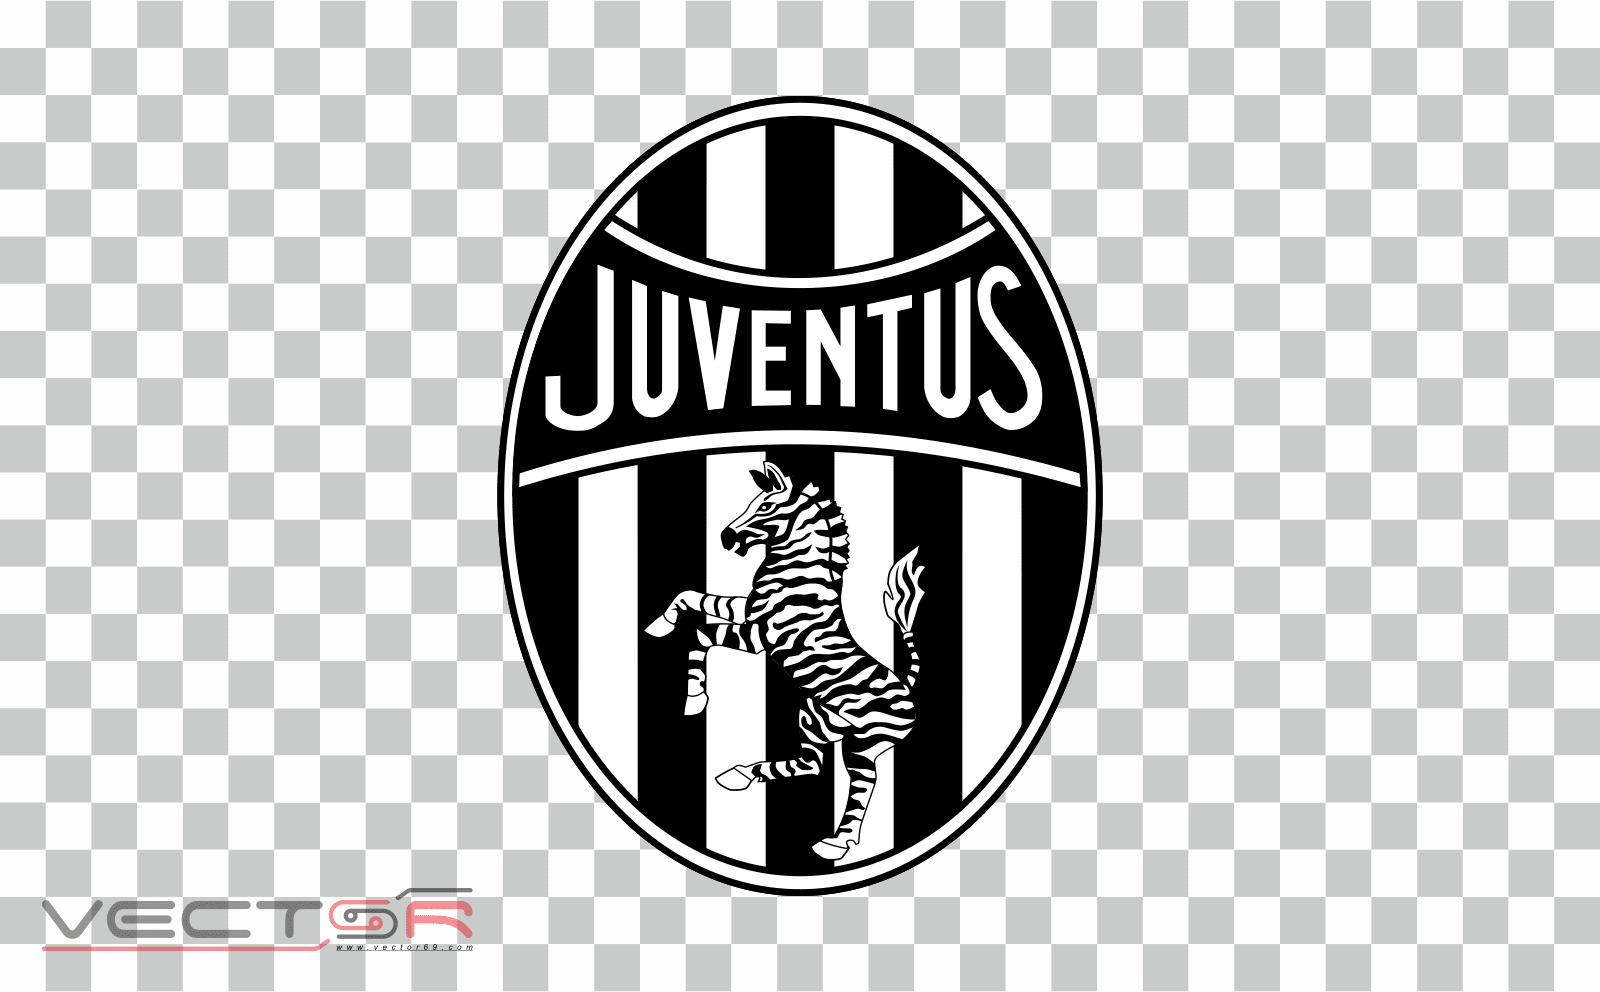 Juventus F.C. (1929) Logo - Download .PNG (Portable Network Graphics) Transparent Images